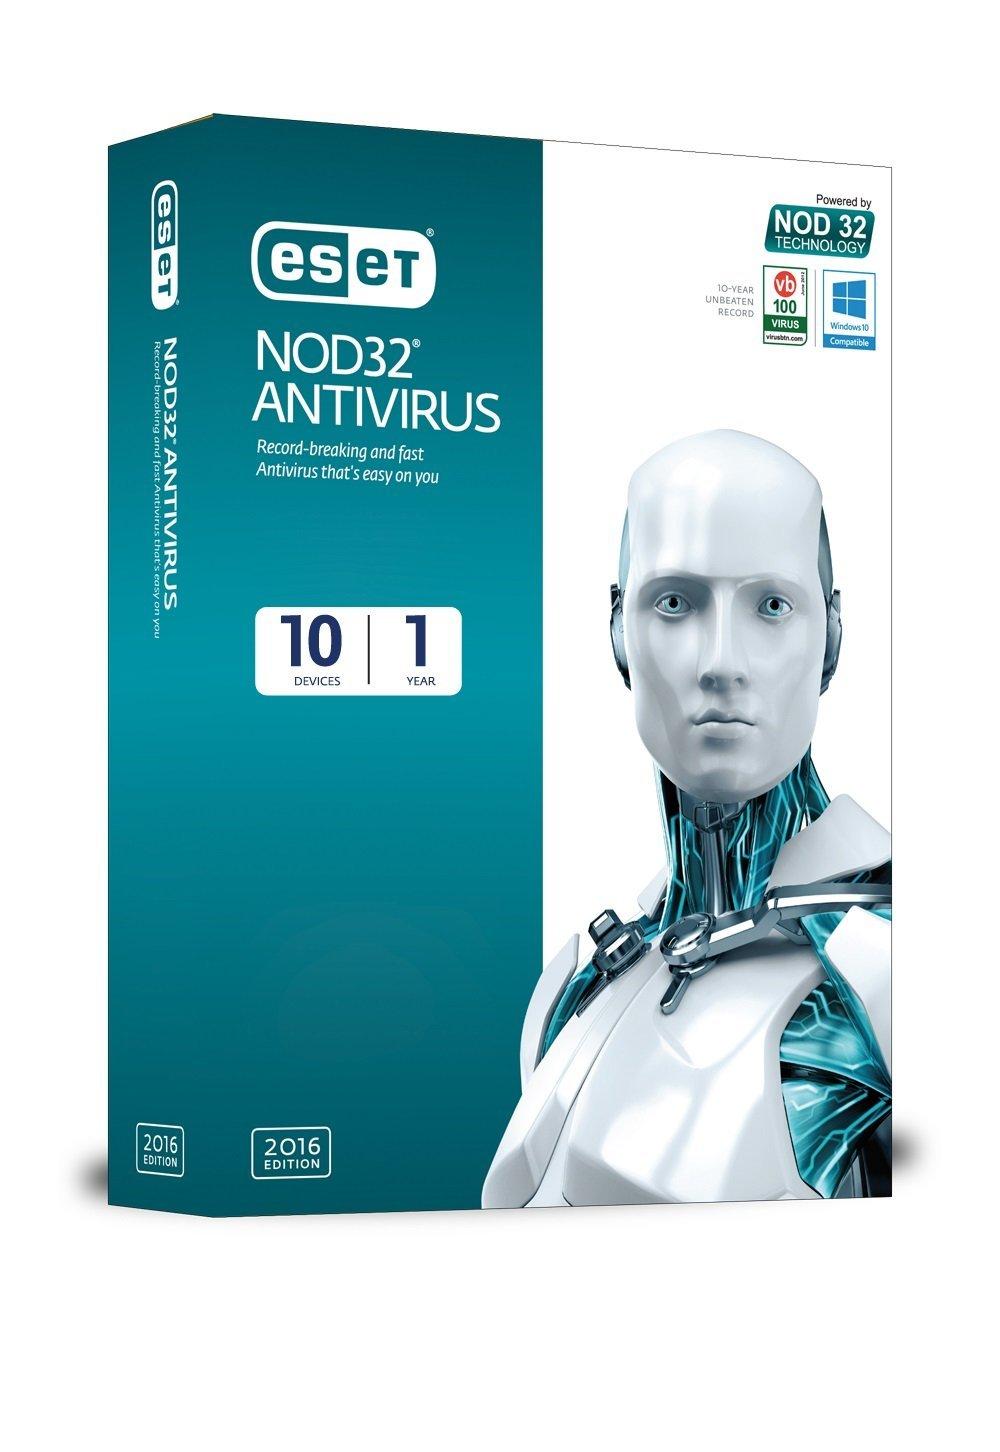 ESET NOD32 Antivirus 10 (valid till 2017) with working ...